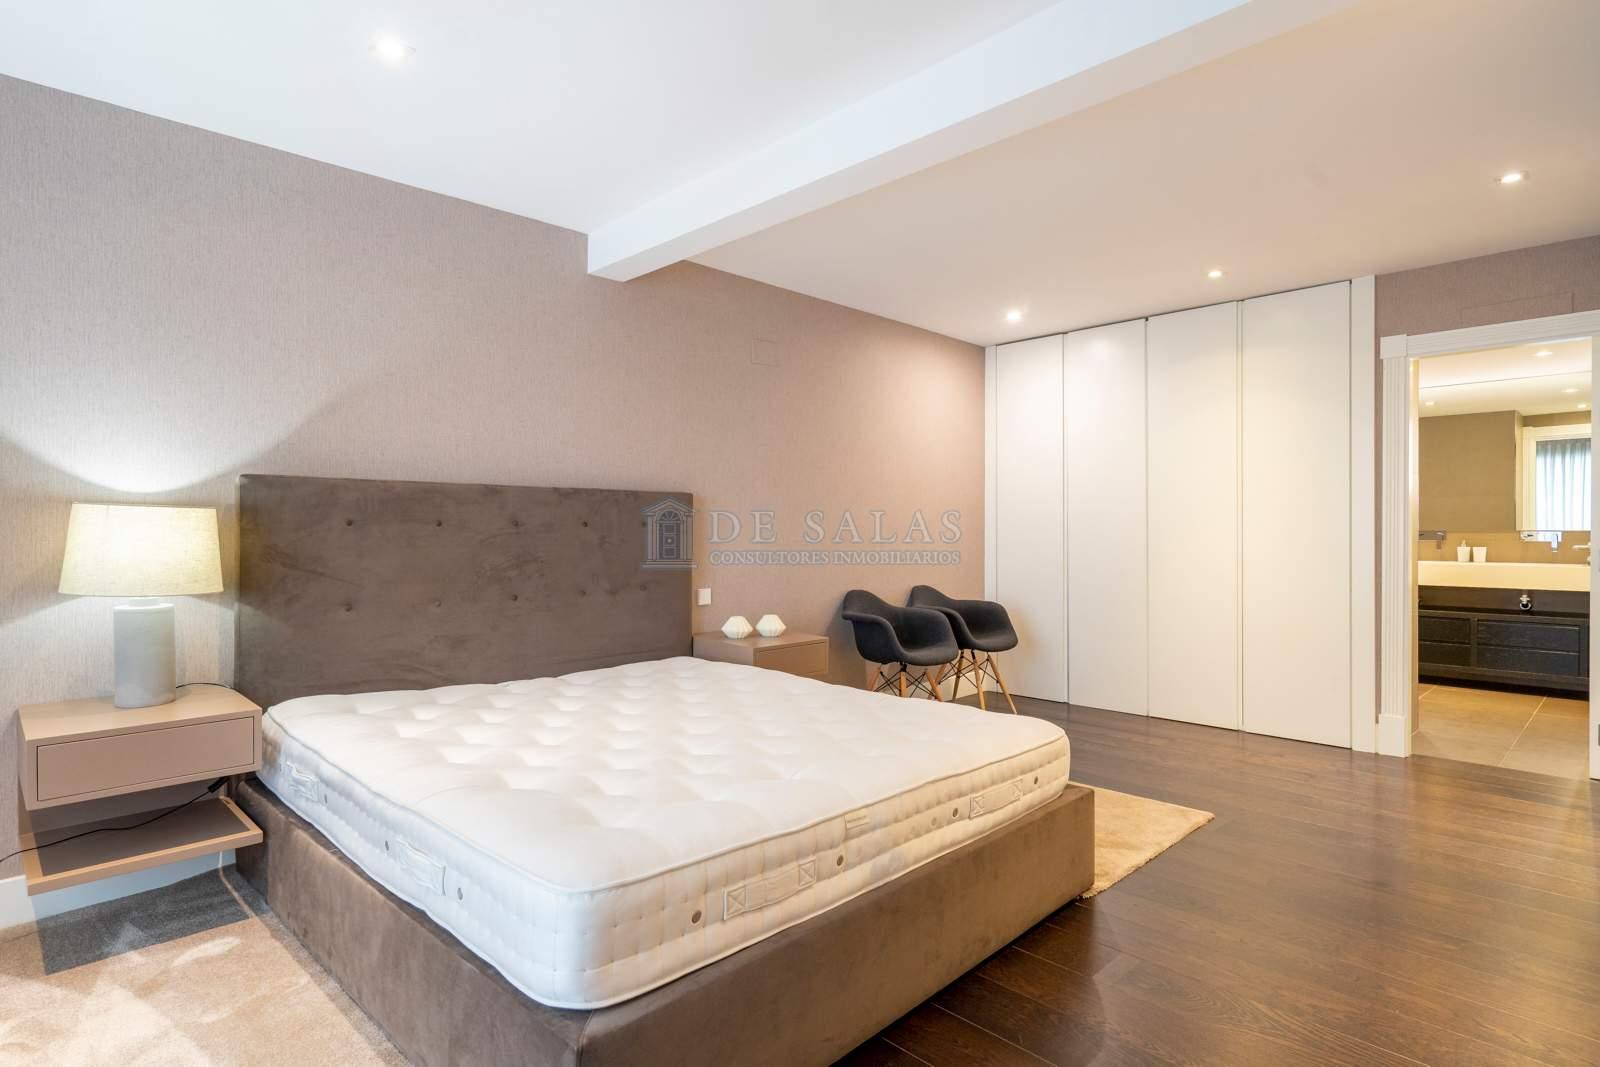 Dormitorio inv. 2-40 Maison La Moraleja